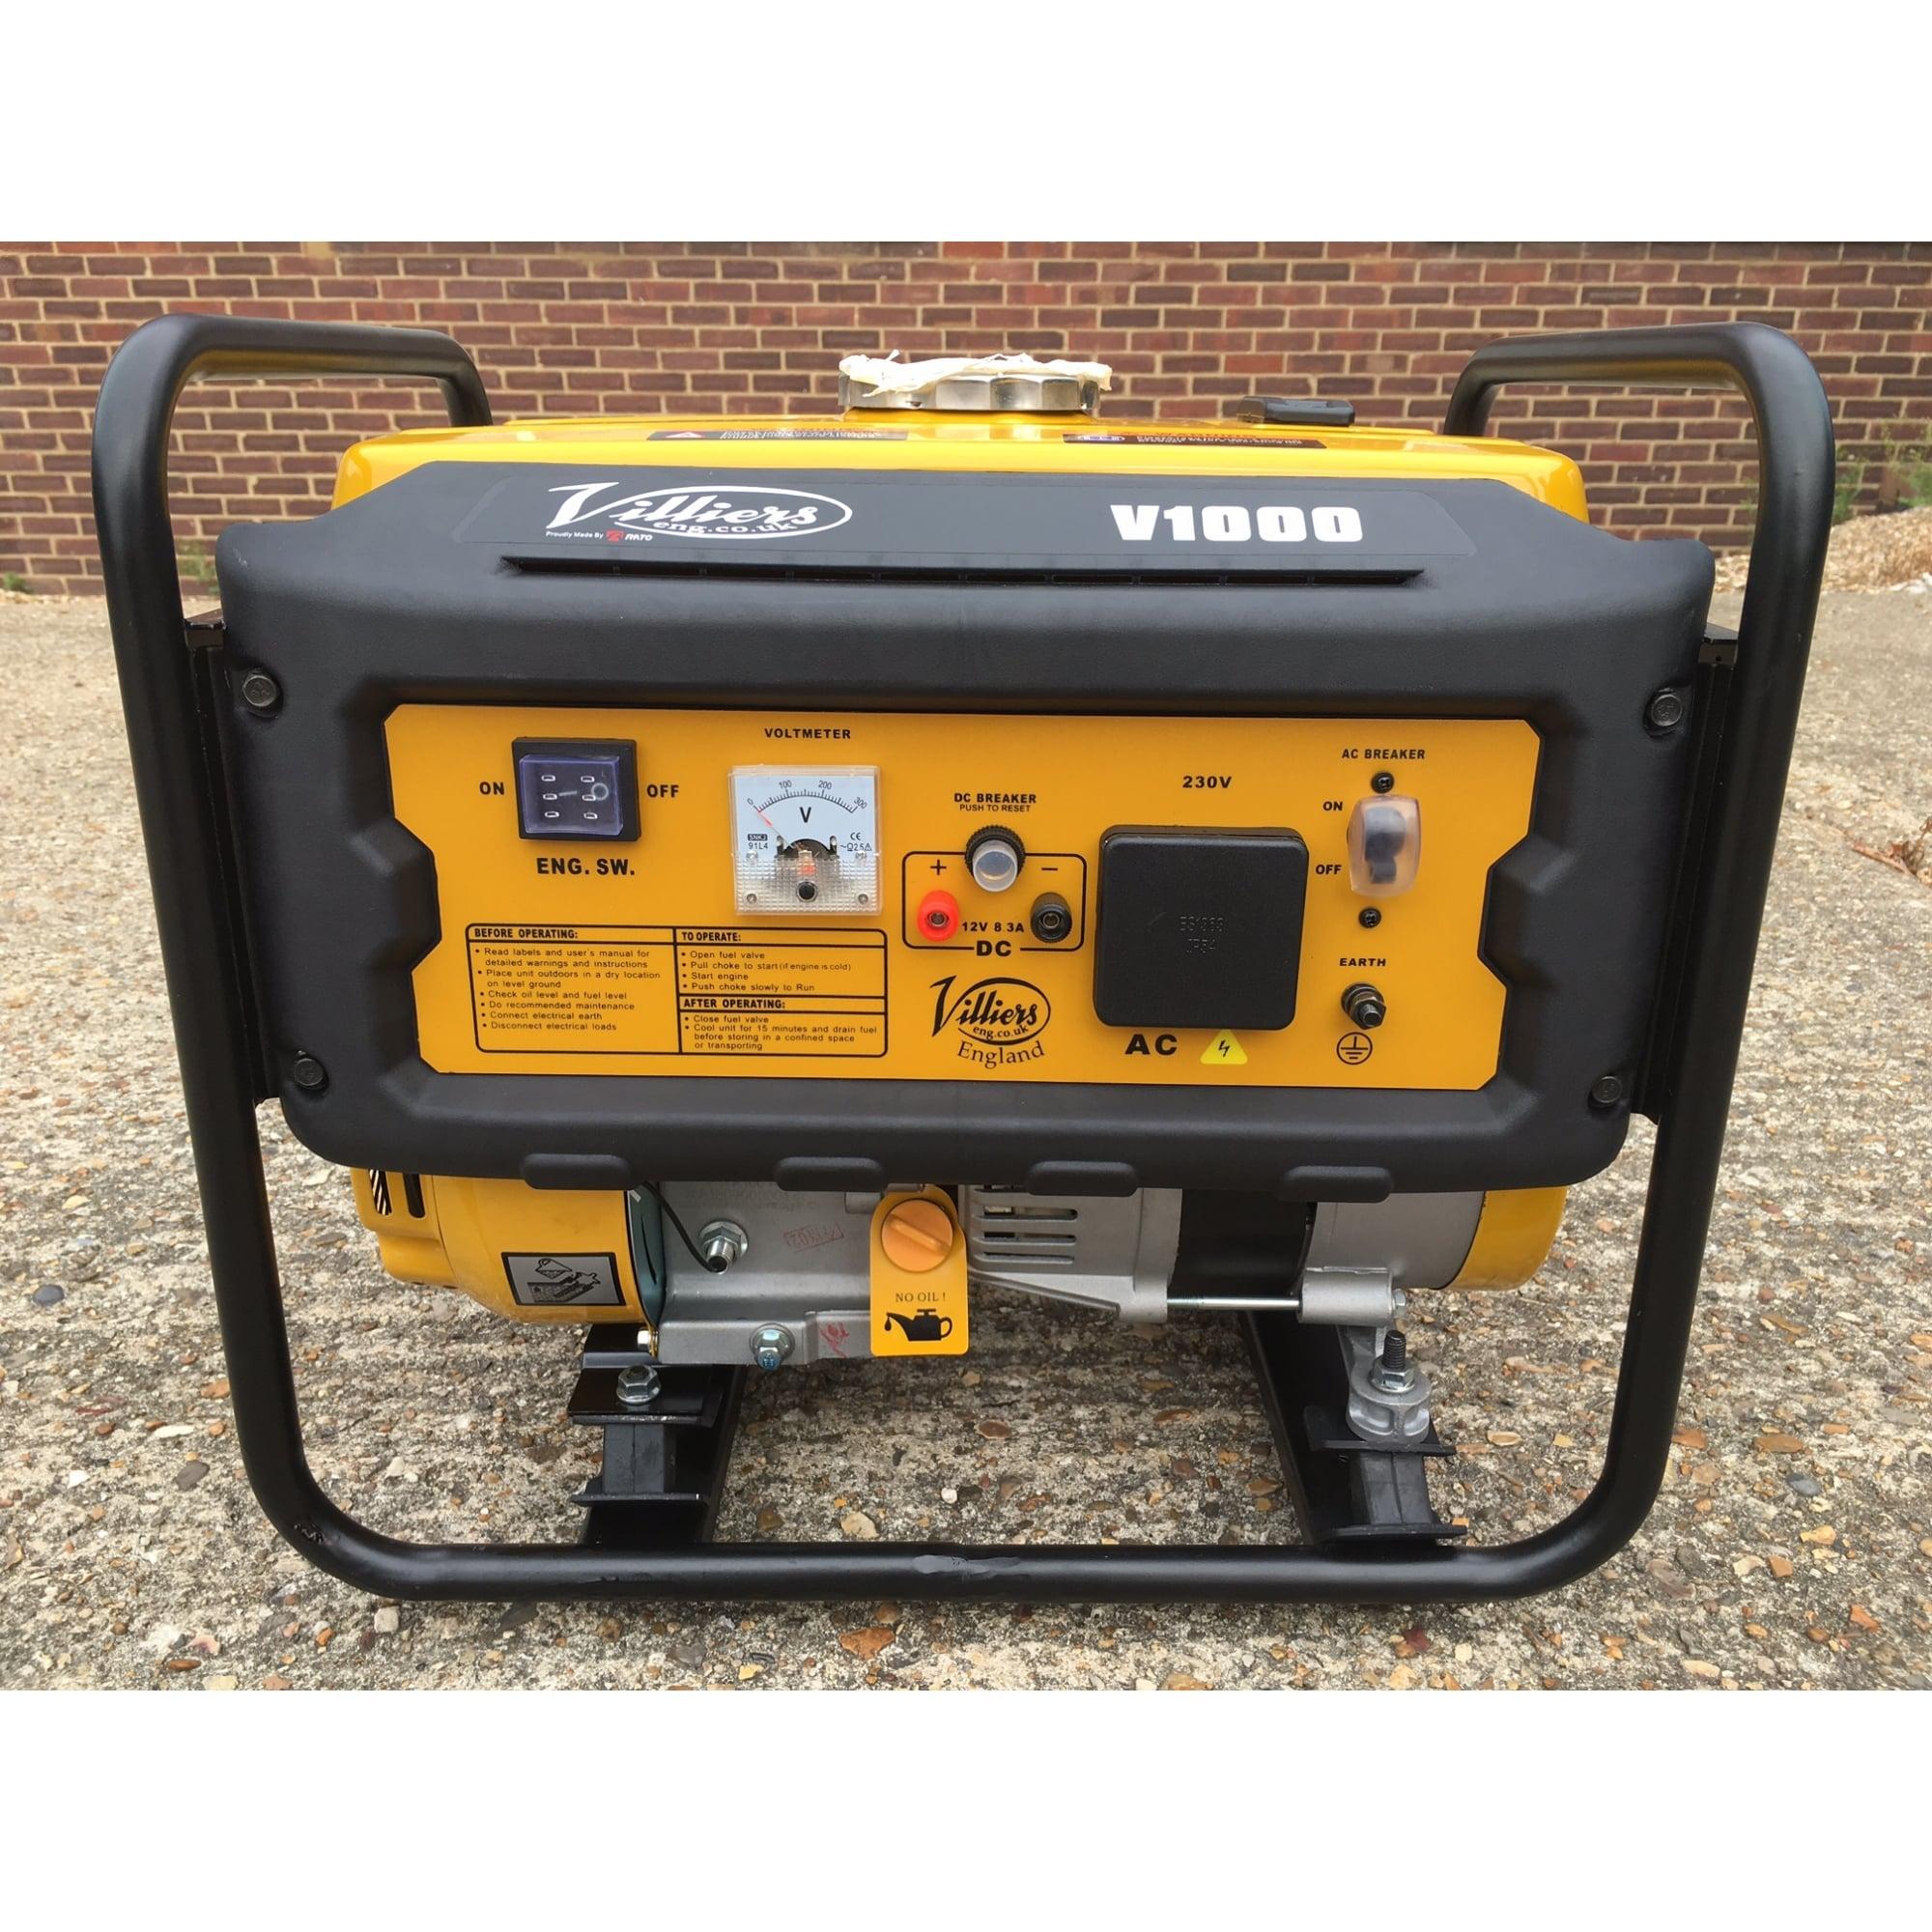 Villiers V1000 Petrol Generator 1KW